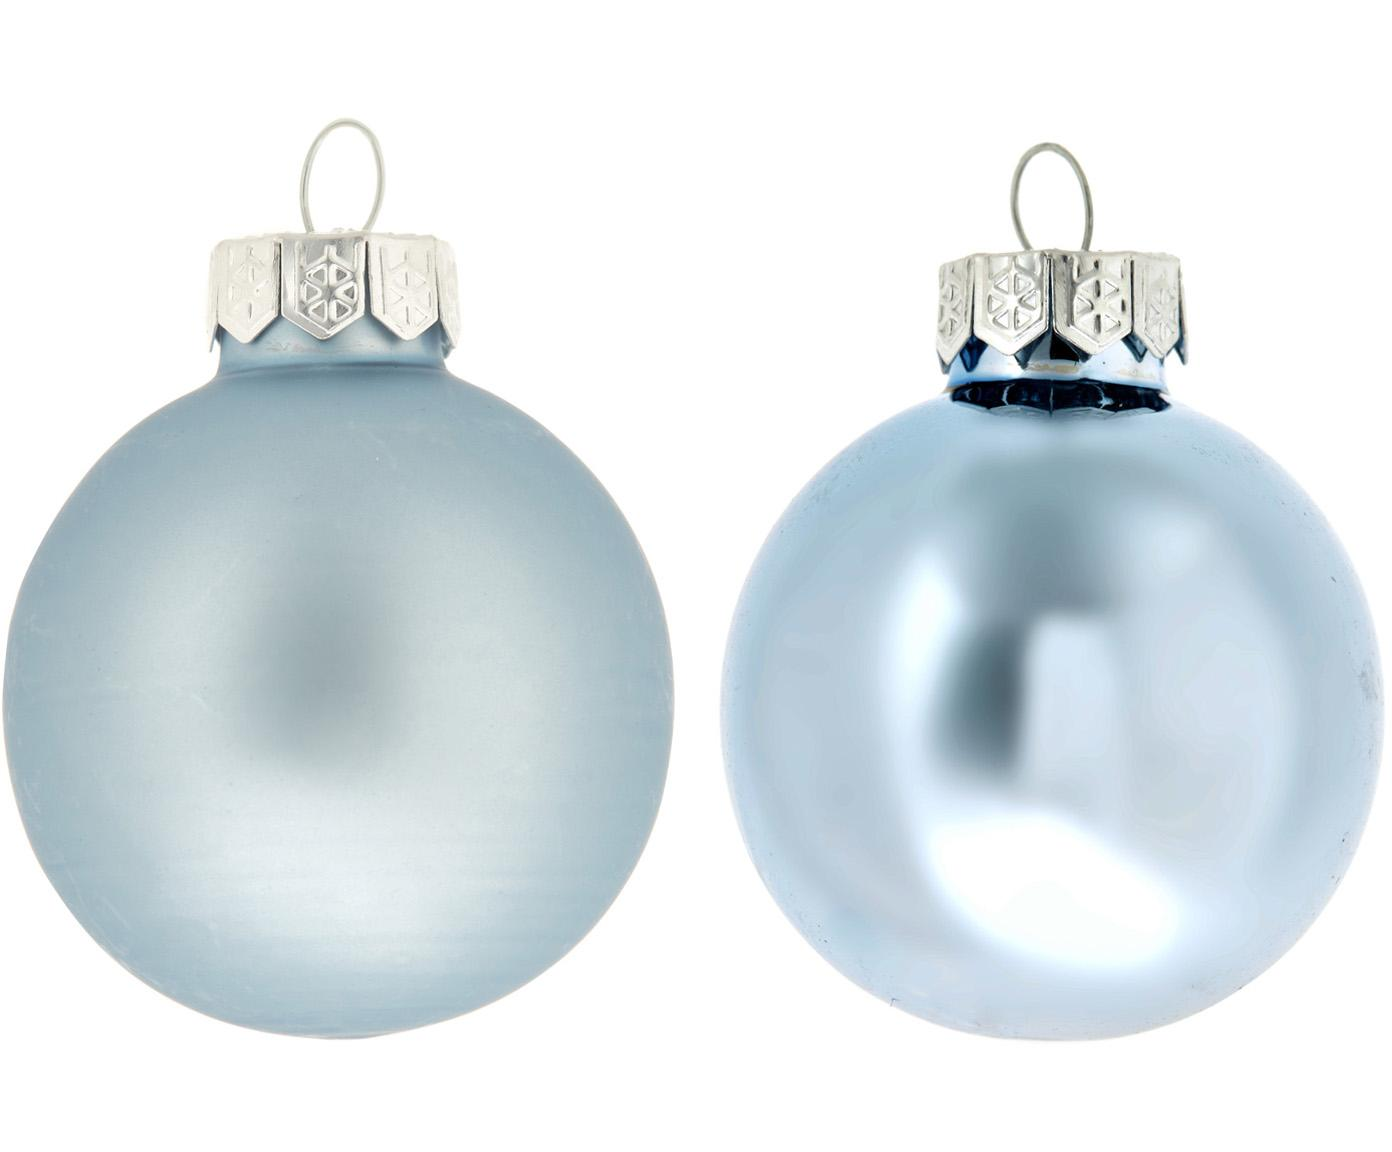 Mini kerstballenset Evergreen Ø4cm, 16-delig, IJsblauw, Ø 4 cm